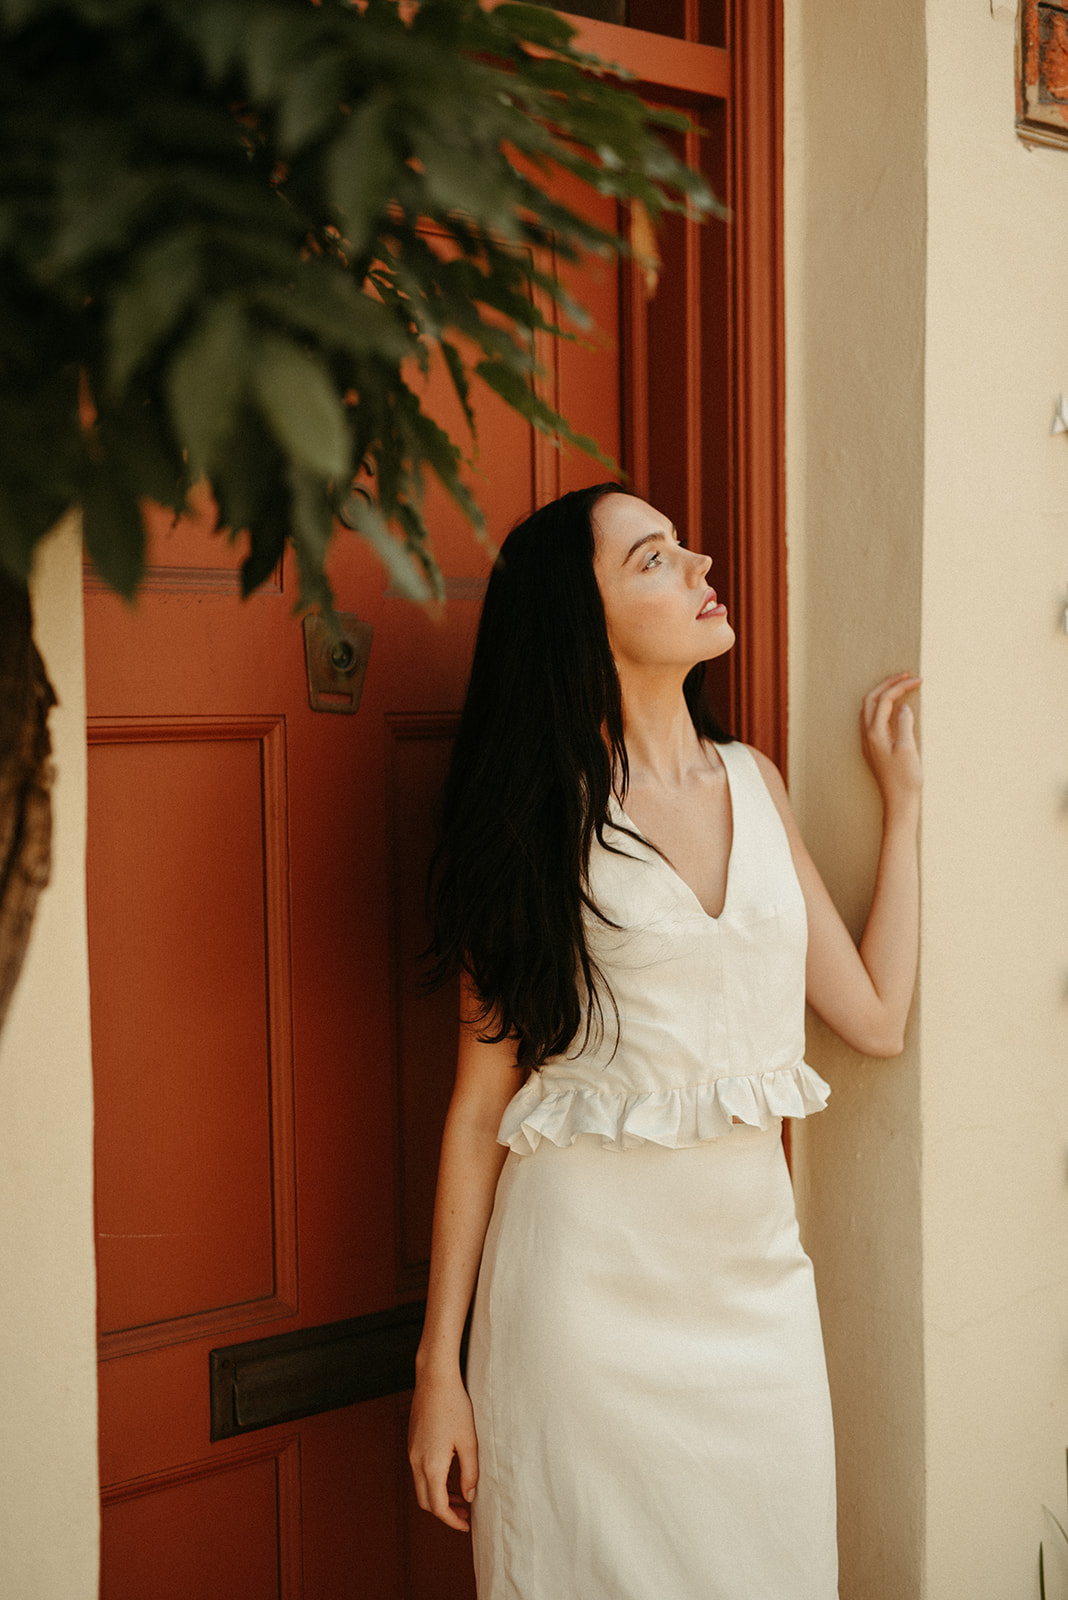 goli-june-bridal-223.jpg